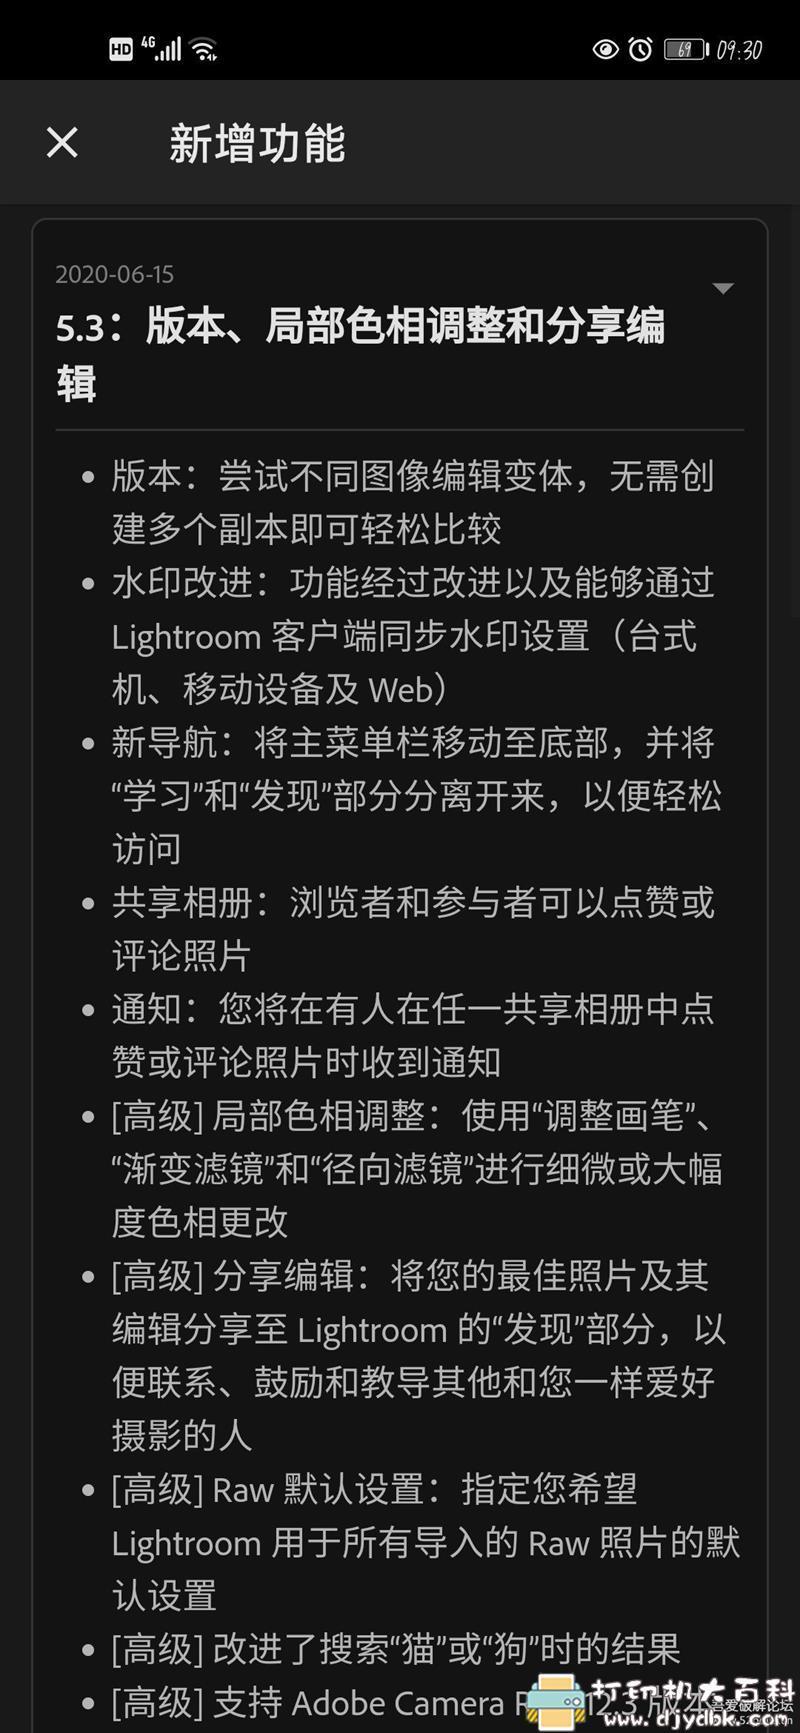 [Android]手机版PS软件 Adobe Photoshop Lightroom CC v5.3.1 for Android 直装解锁高级版 配图 No.7